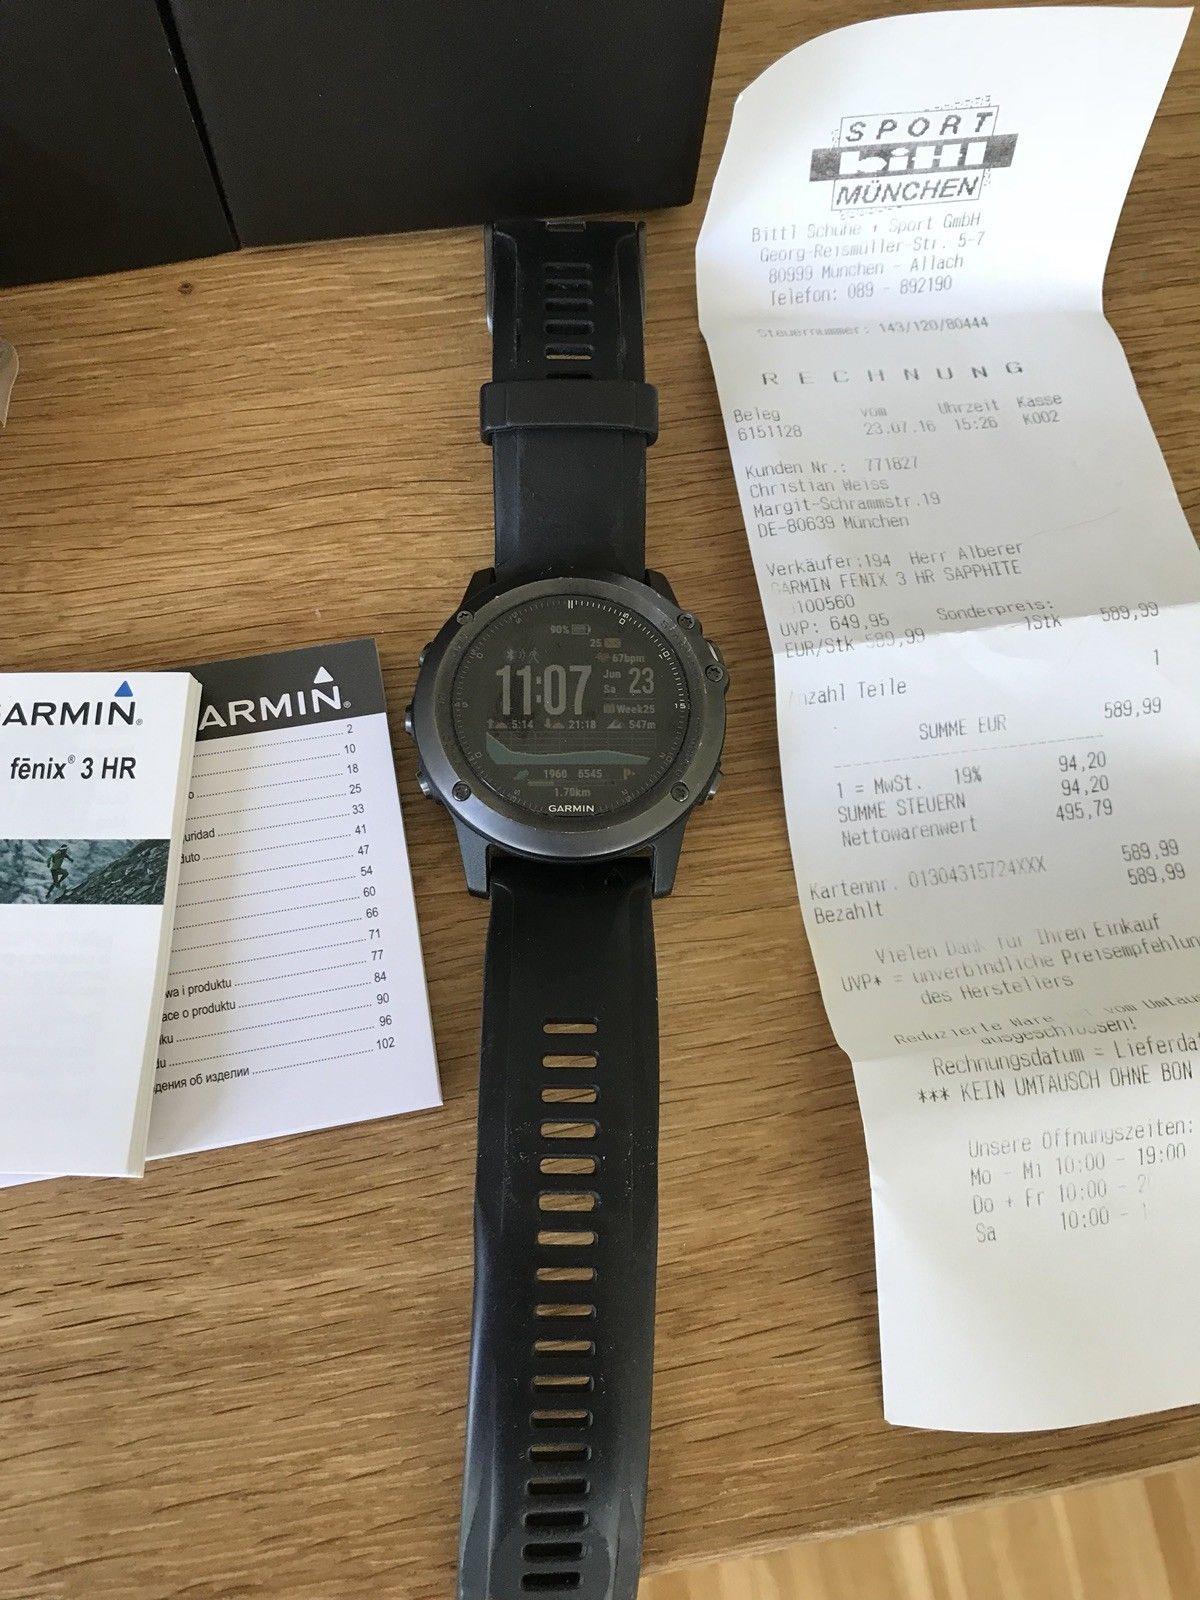 Garmin fenix 3 Saphir HR 1,2 Zoll GPS-Multisportuhr mit Schwarzem Silikonarmband